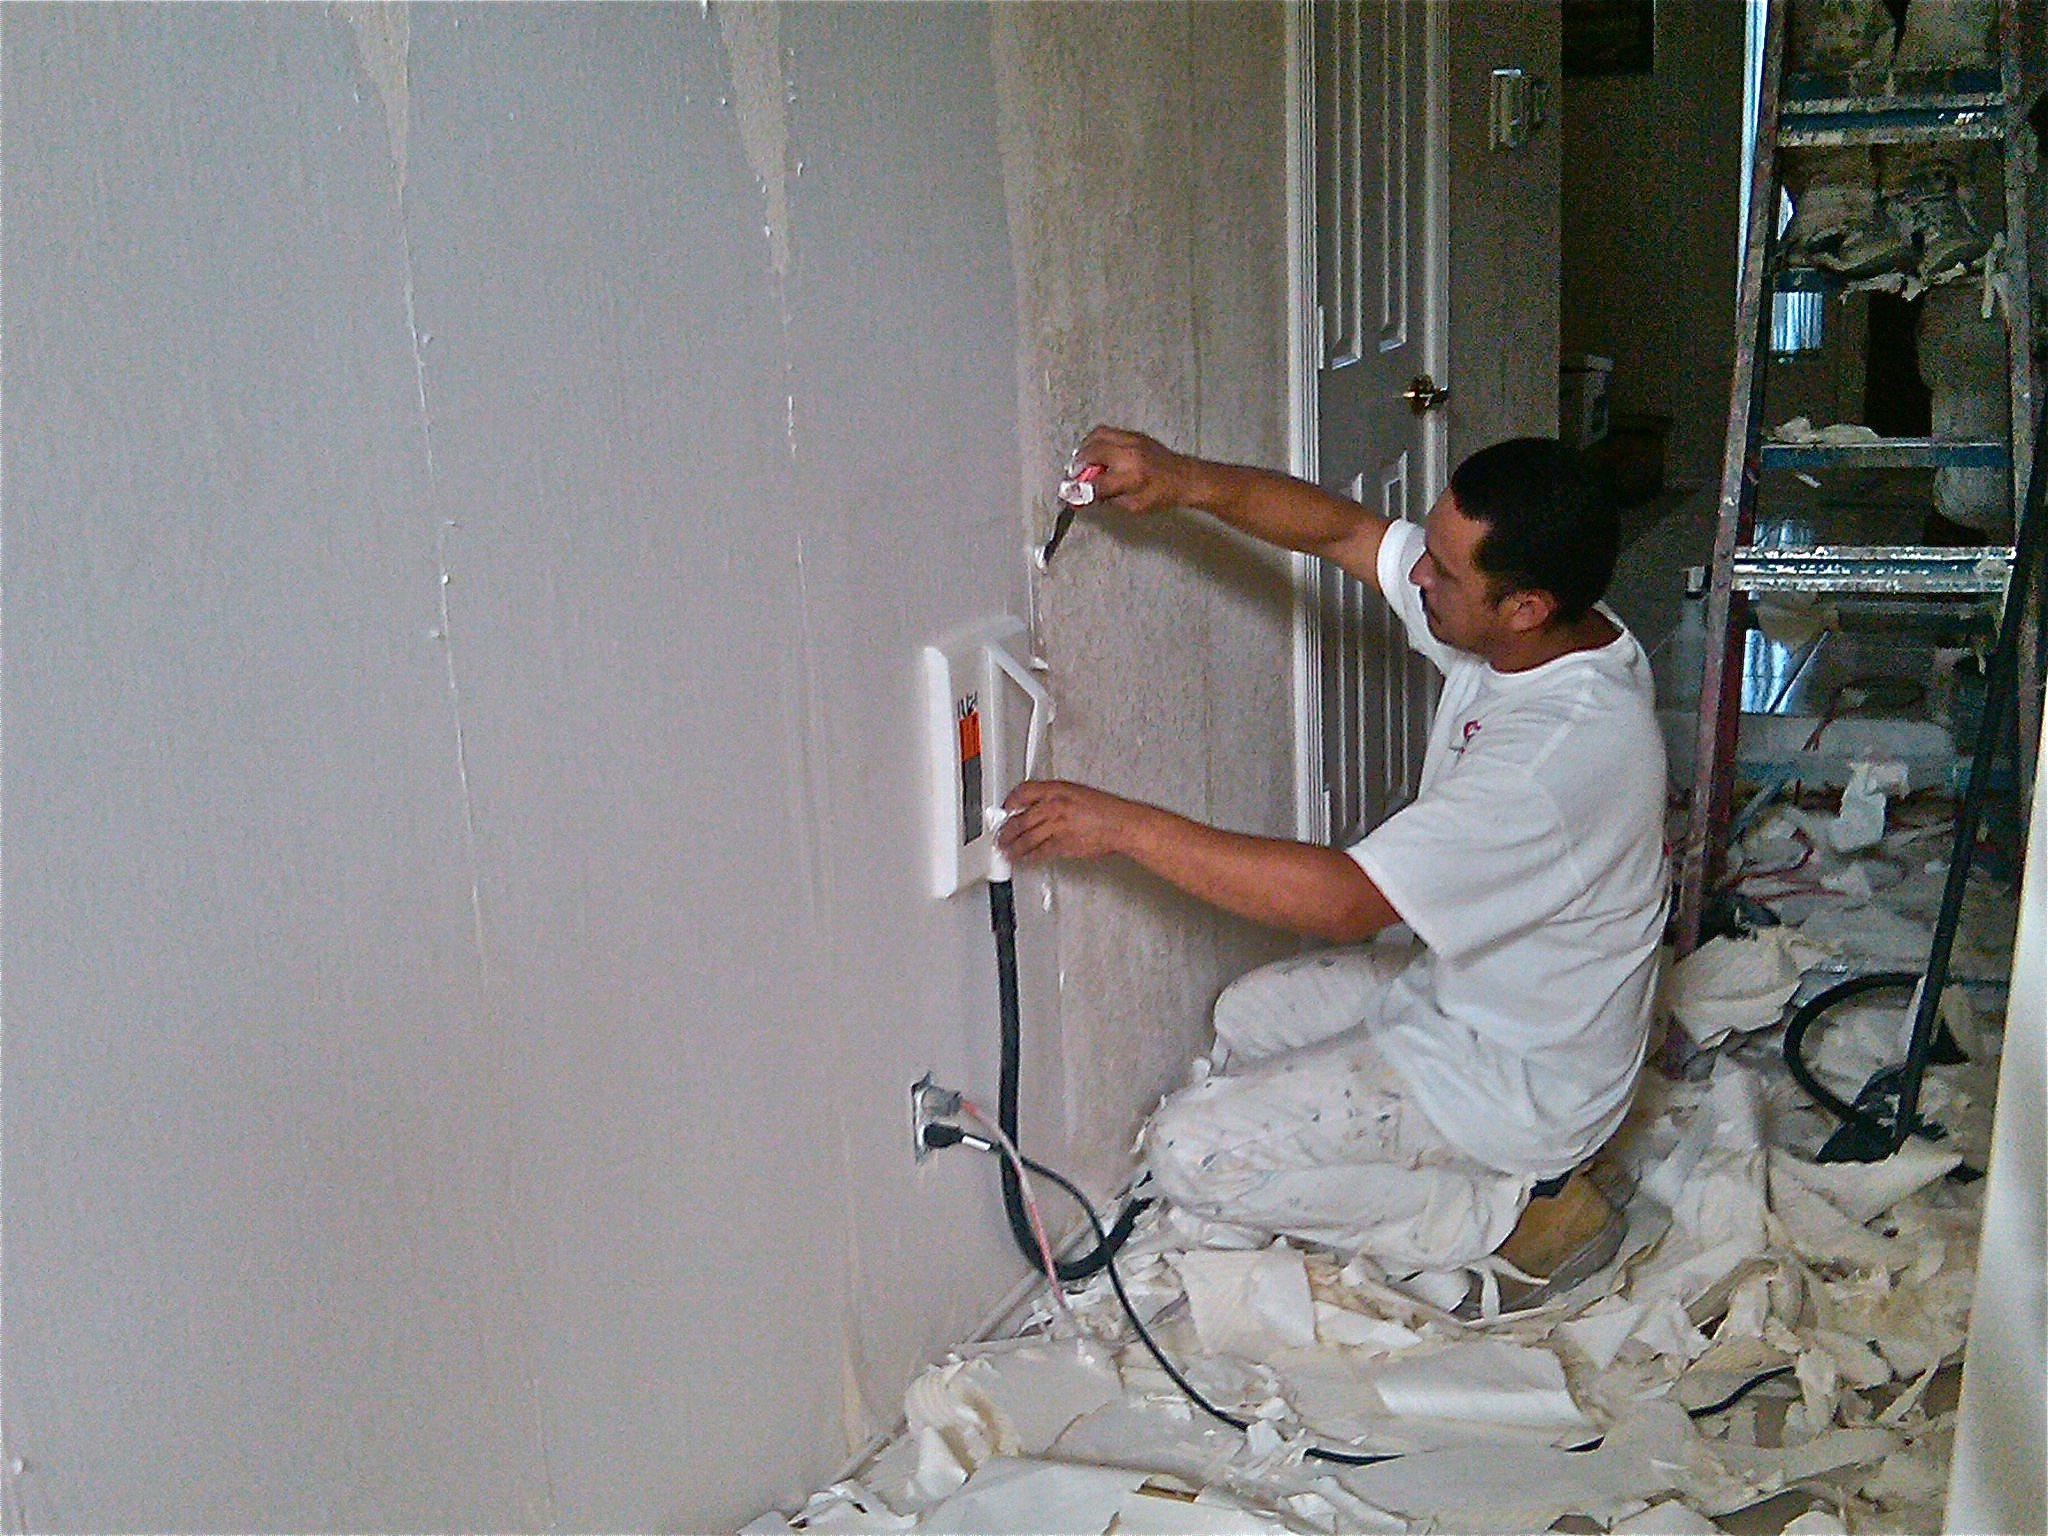 Home Depot Steamer Remove Wallpaper